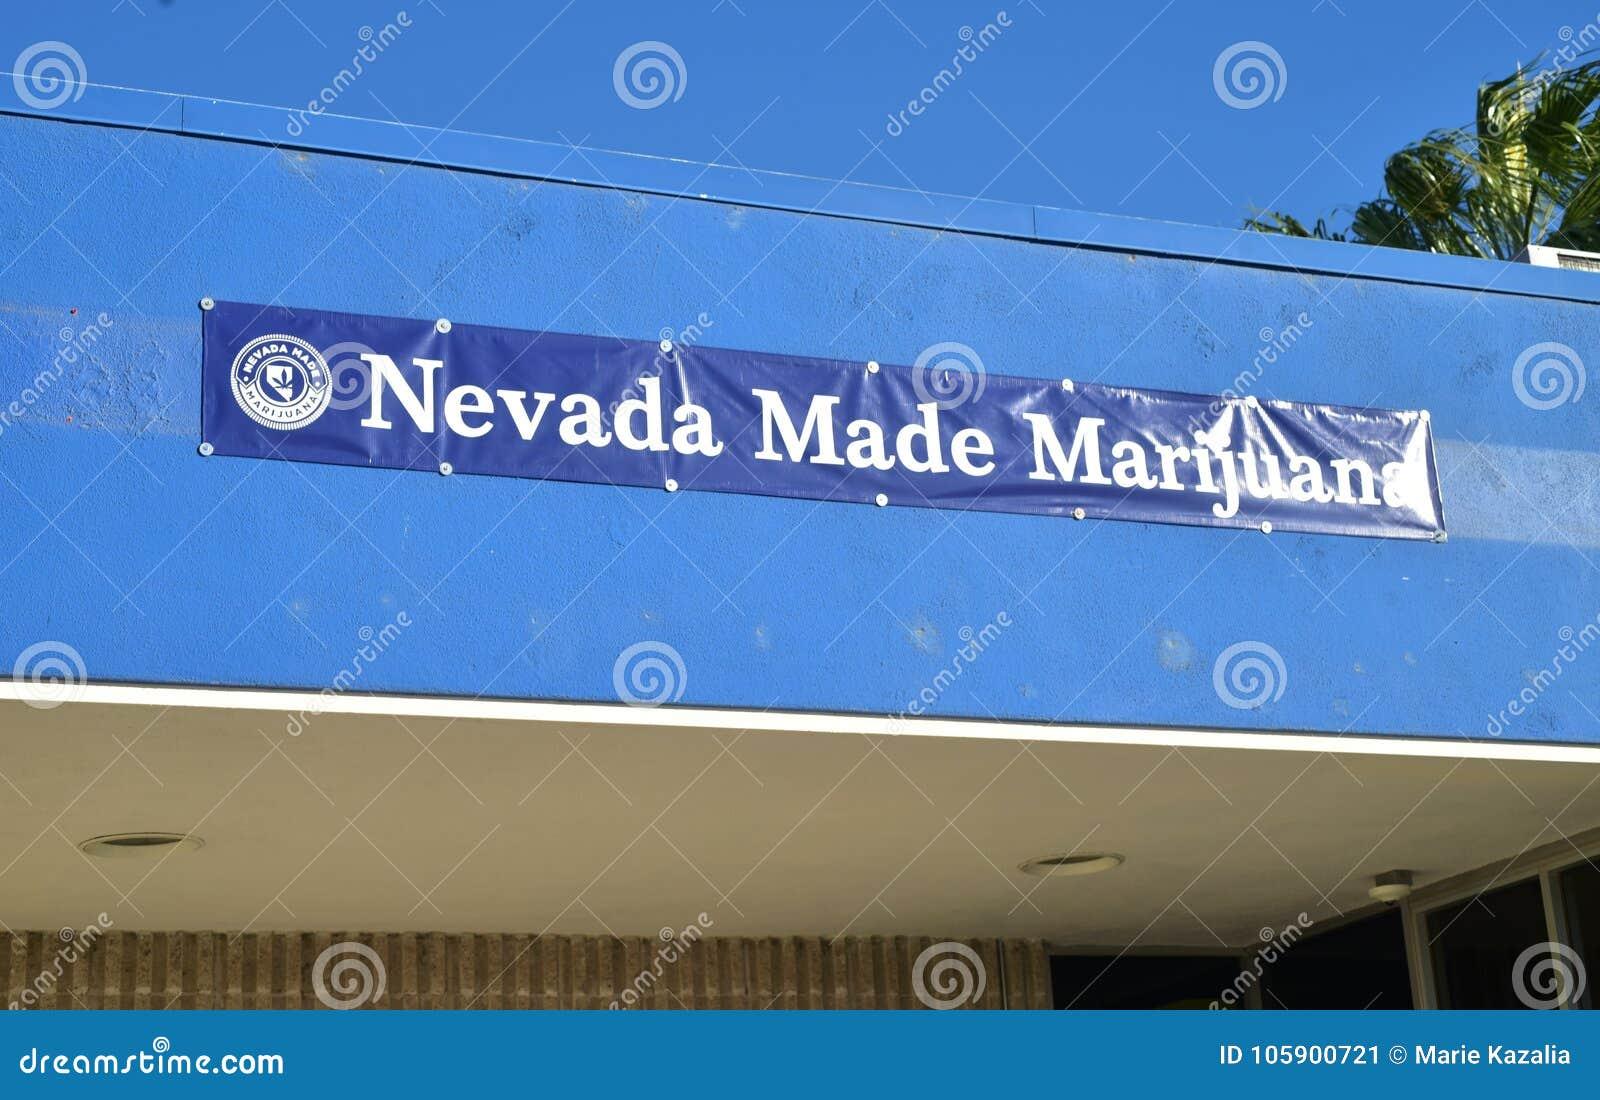 Nevada Made Marijuana Recreational Sales Dispensary